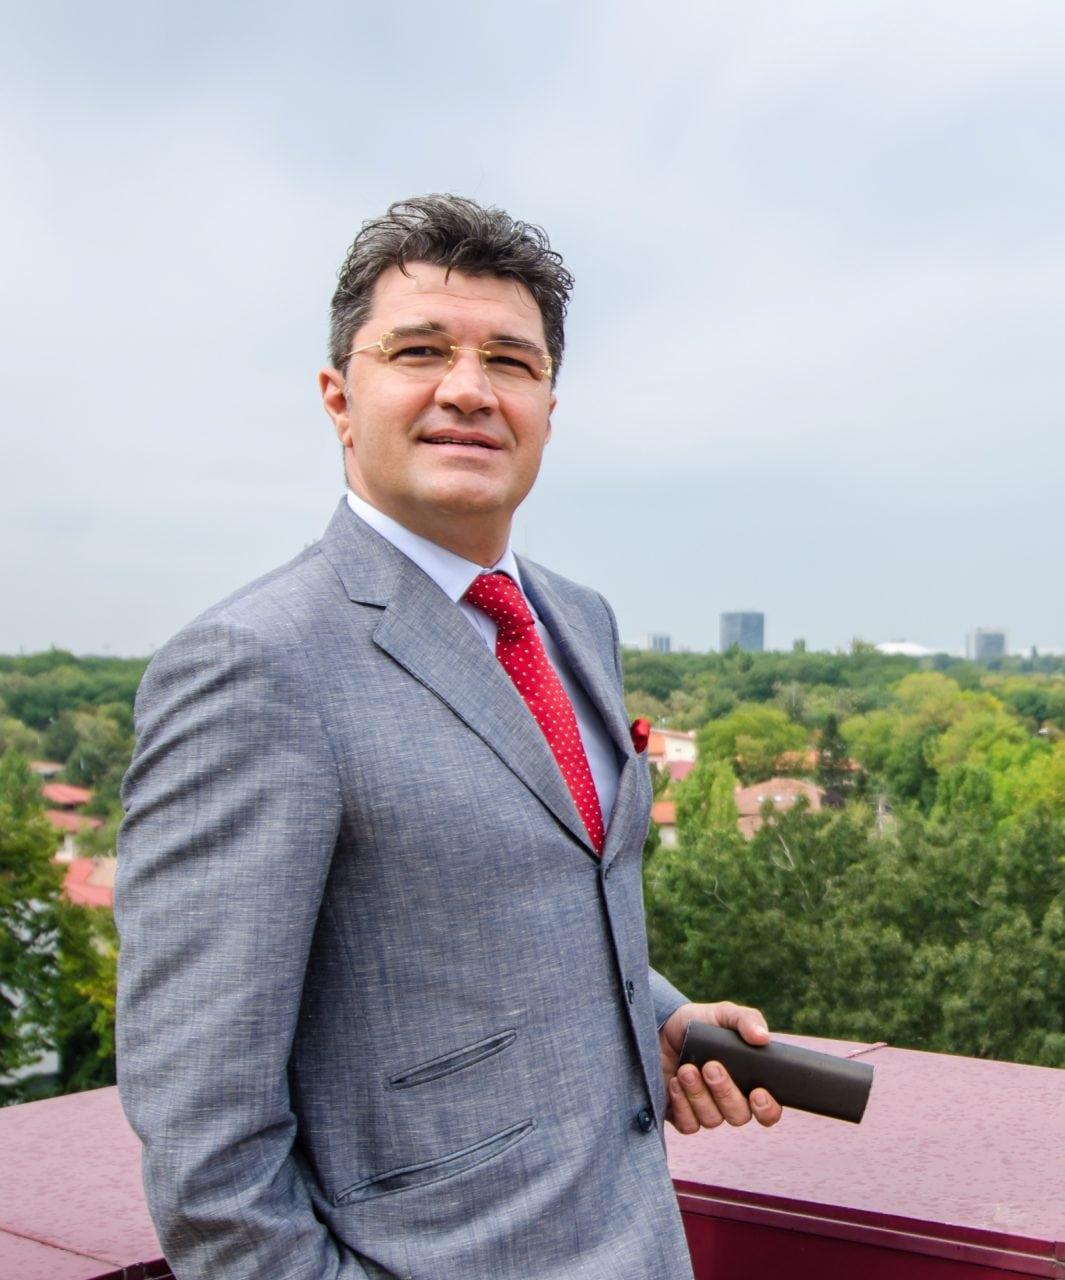 Eduard Uzunov Regatta - Eduard Uzunov: Stocul de terenuri bune este aproape epuizat